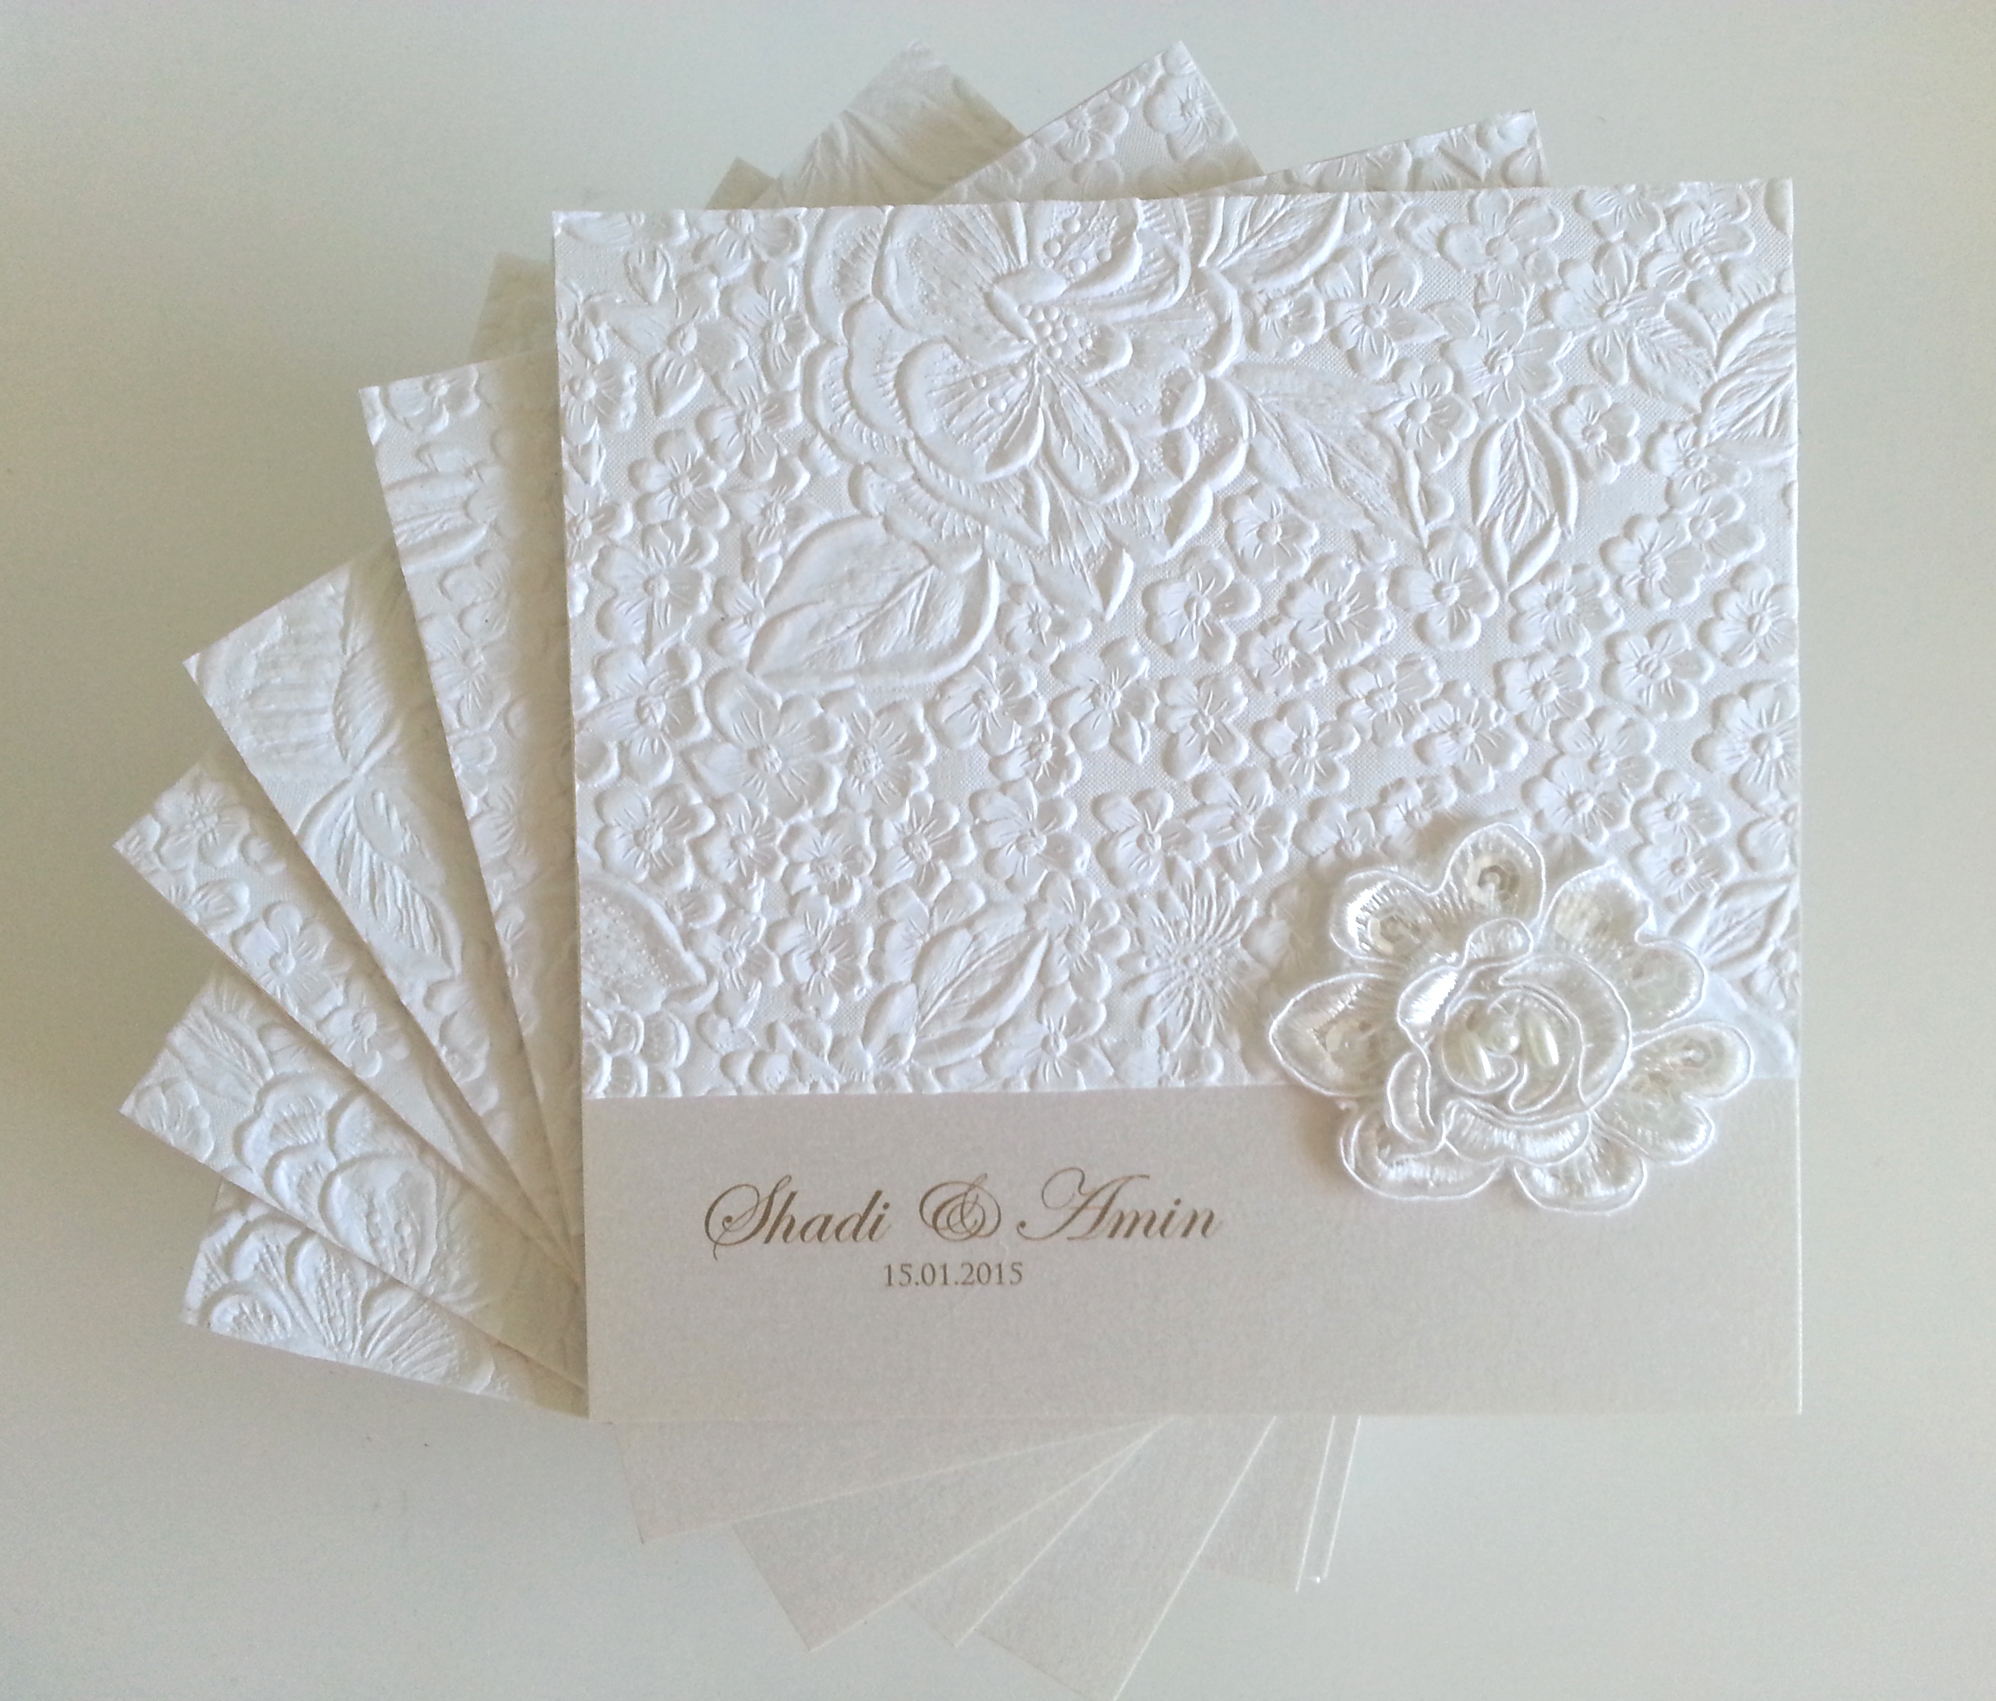 Embossed rose lace folded square wedding invitation sydney.jpg